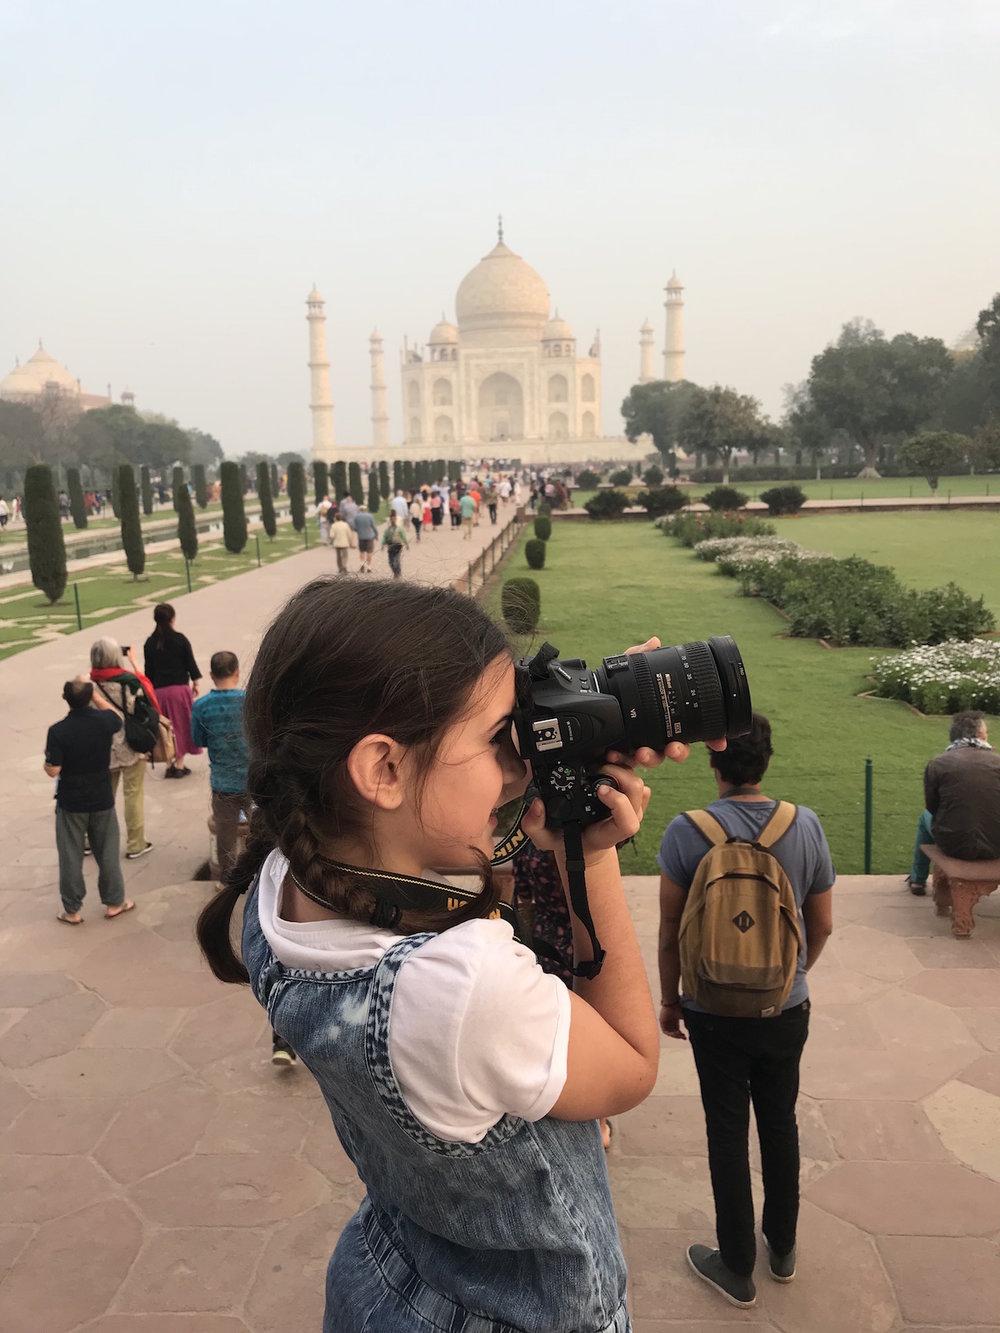 The Taj Mahal at 6:30 AM, just after sunrise